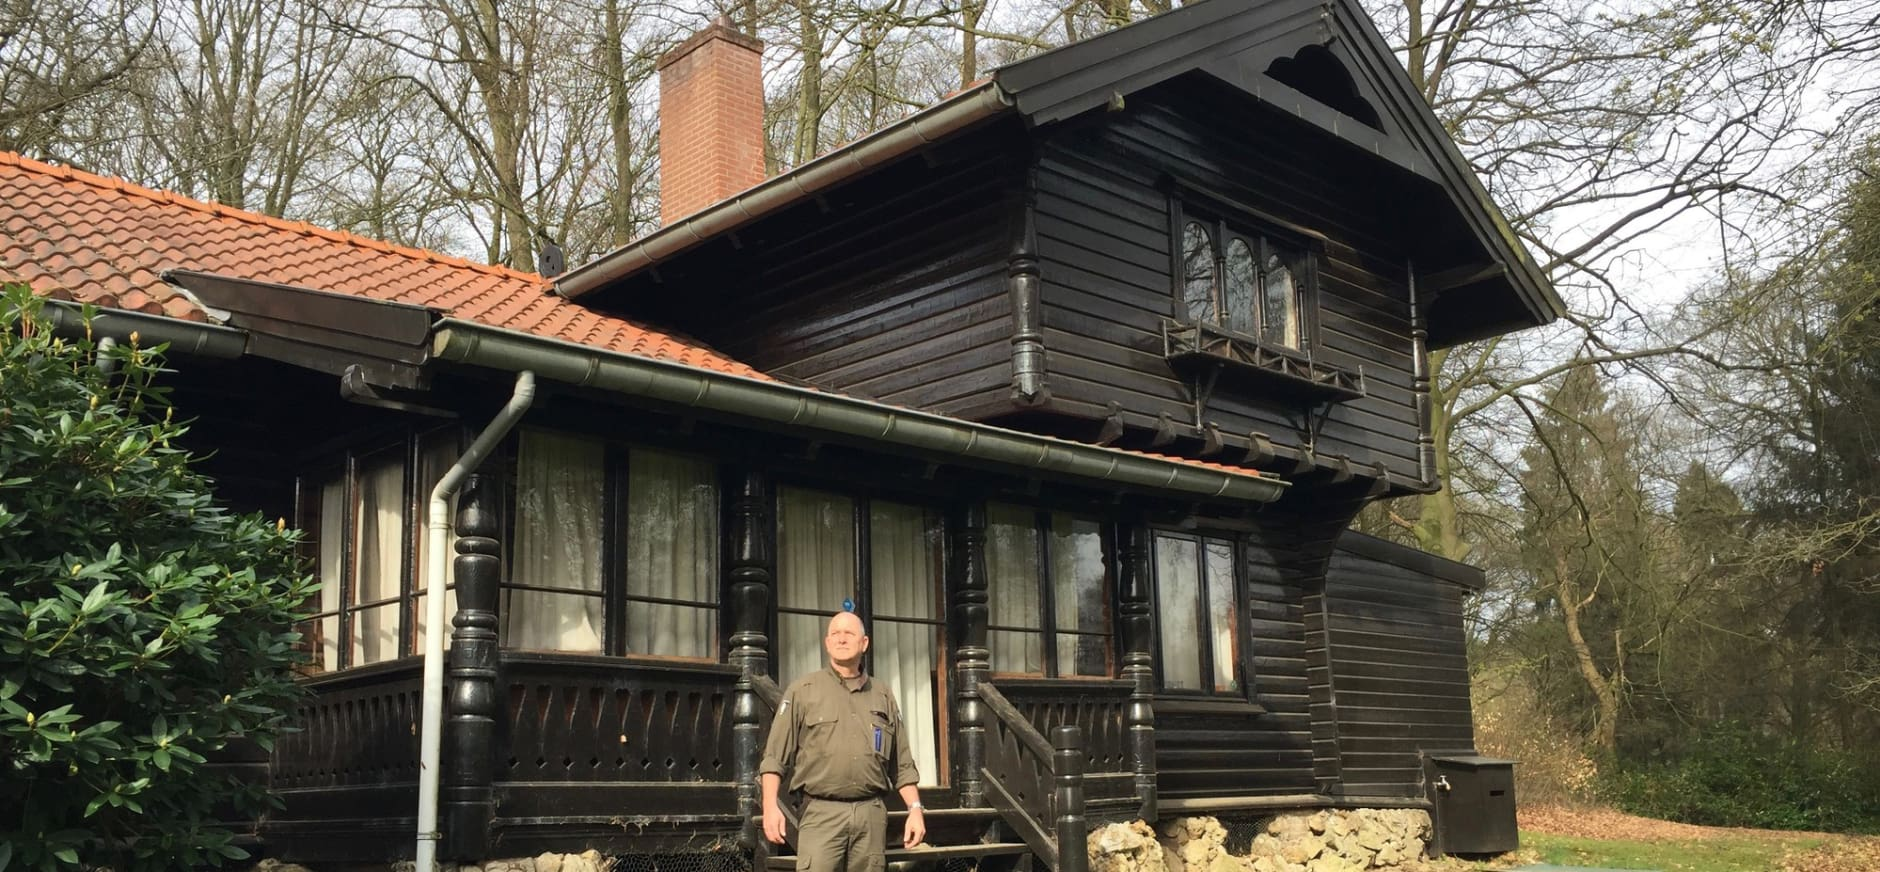 Boswachter Paul vertelt over Noorse huisje